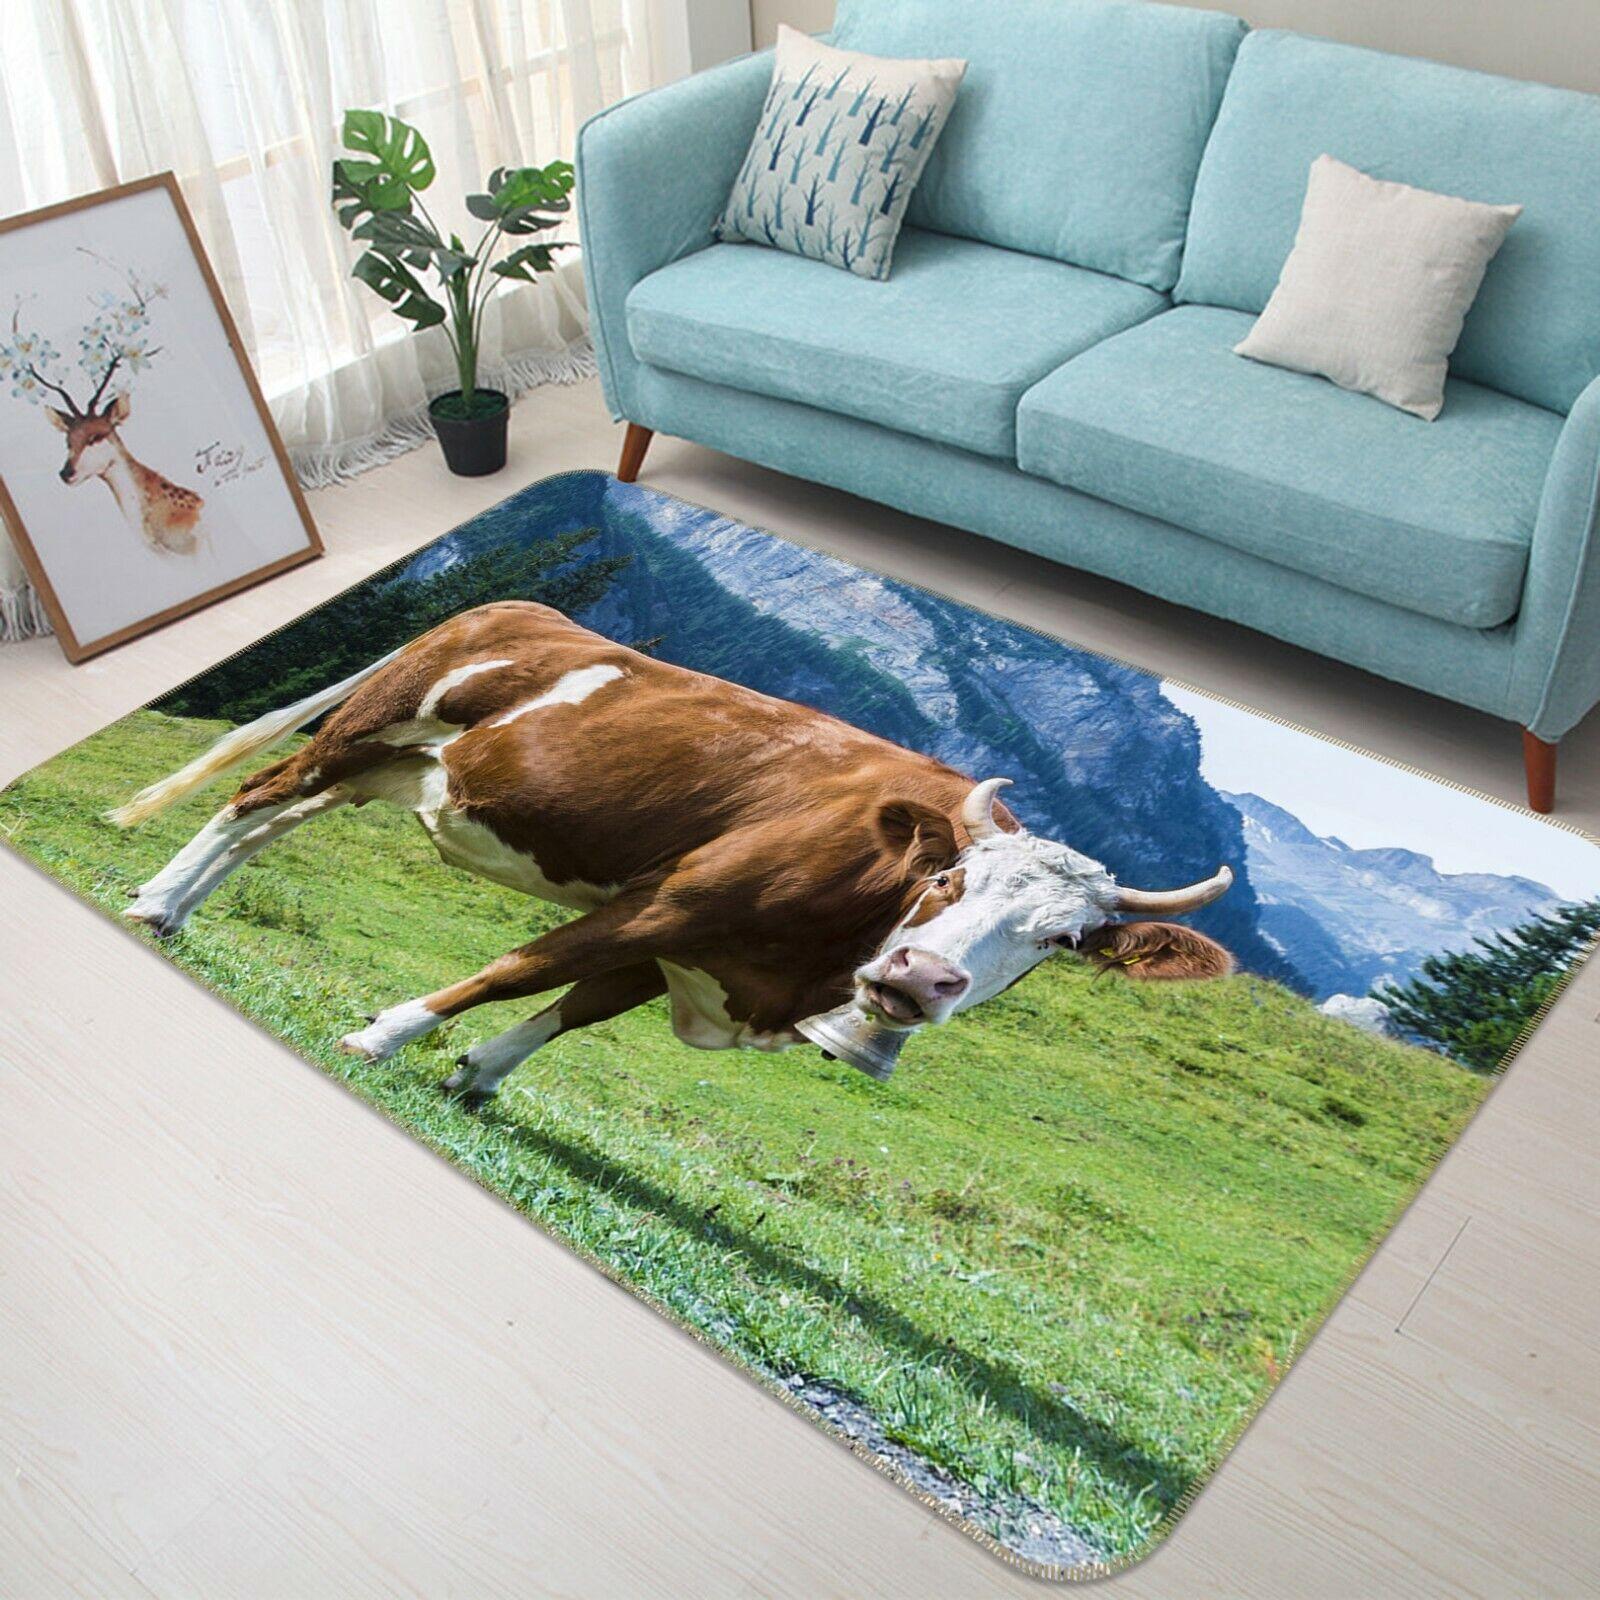 3D BOVINI Prairie C044 Animale tappetino antiscivolo tappeto rossoondo elegante Tappeto Wendy